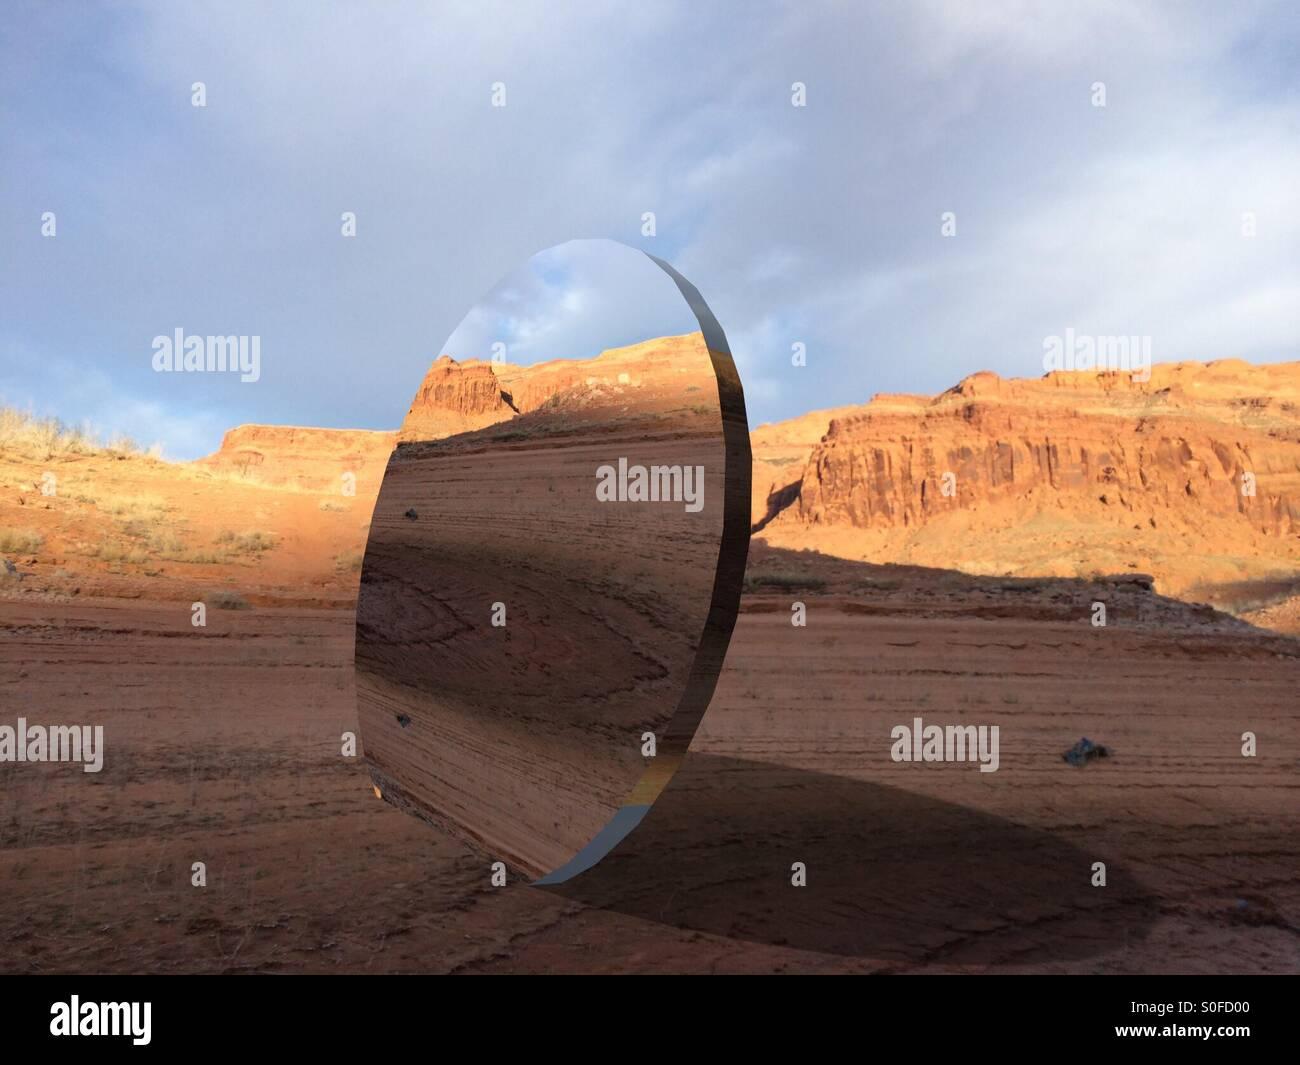 Grand miroir rond en désert Photo Stock